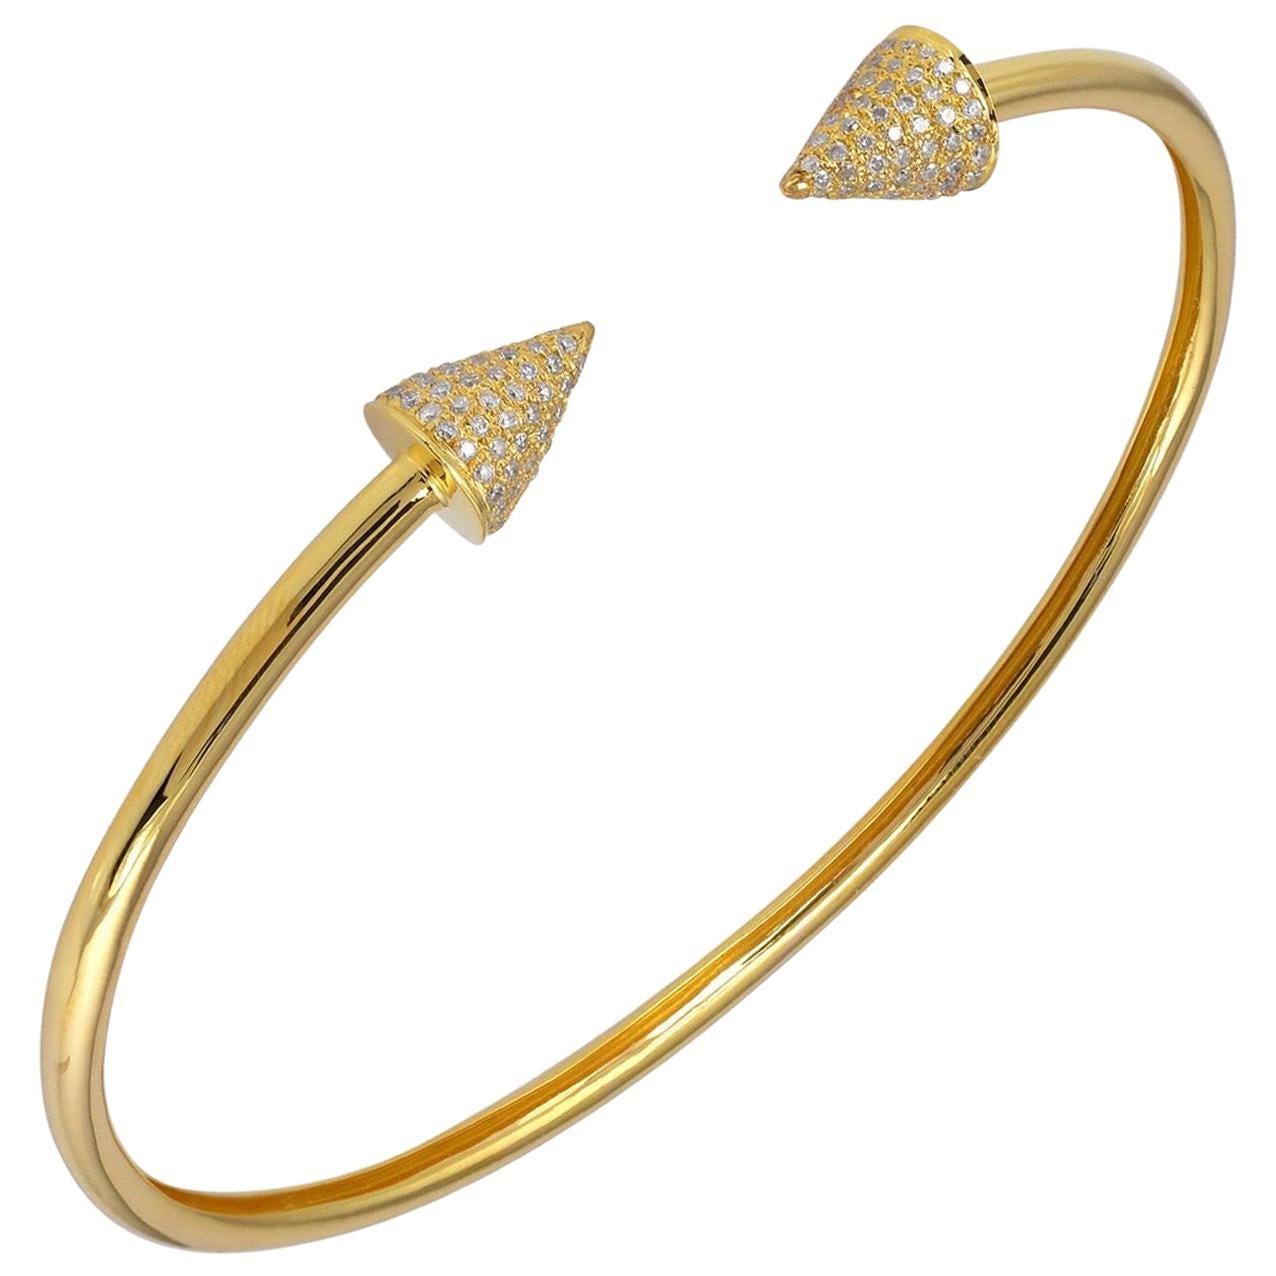 Spike 18 Karat Yellow Gold Diamond Cuff Bracelet